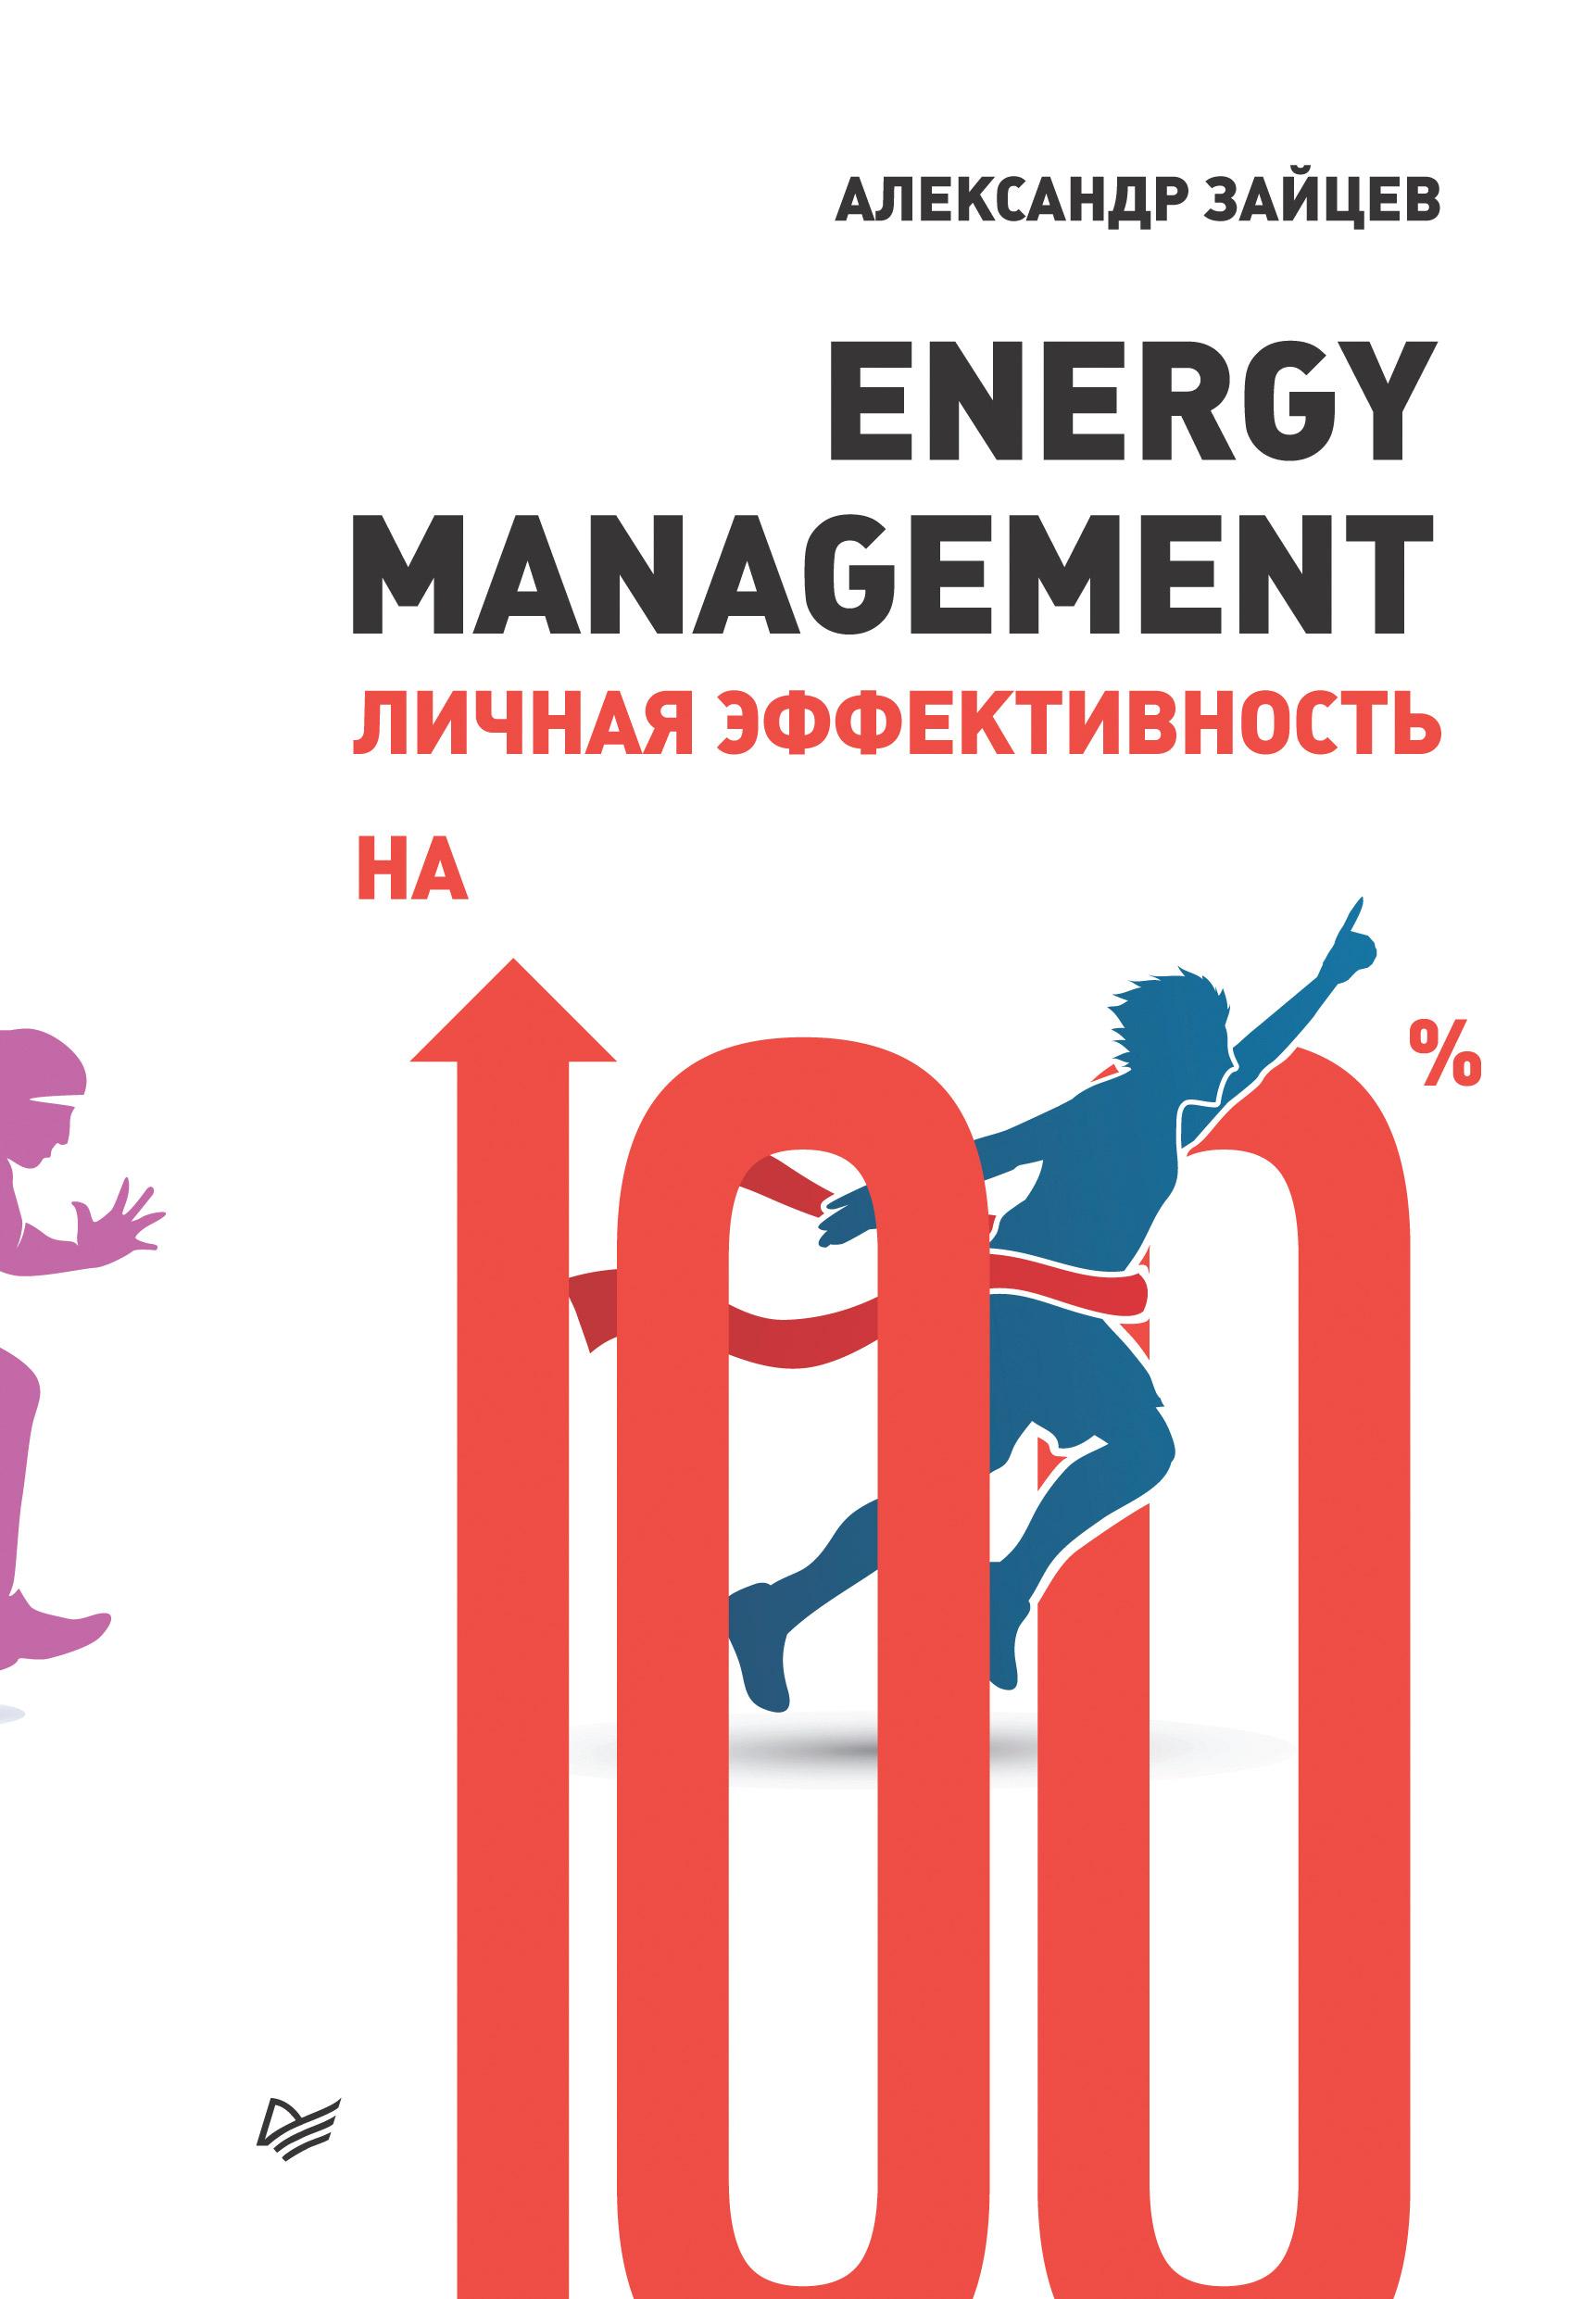 Александр Зайцев Energy management. Личная эффективность на 100% зайцев а energy management личная эффективность на 100%